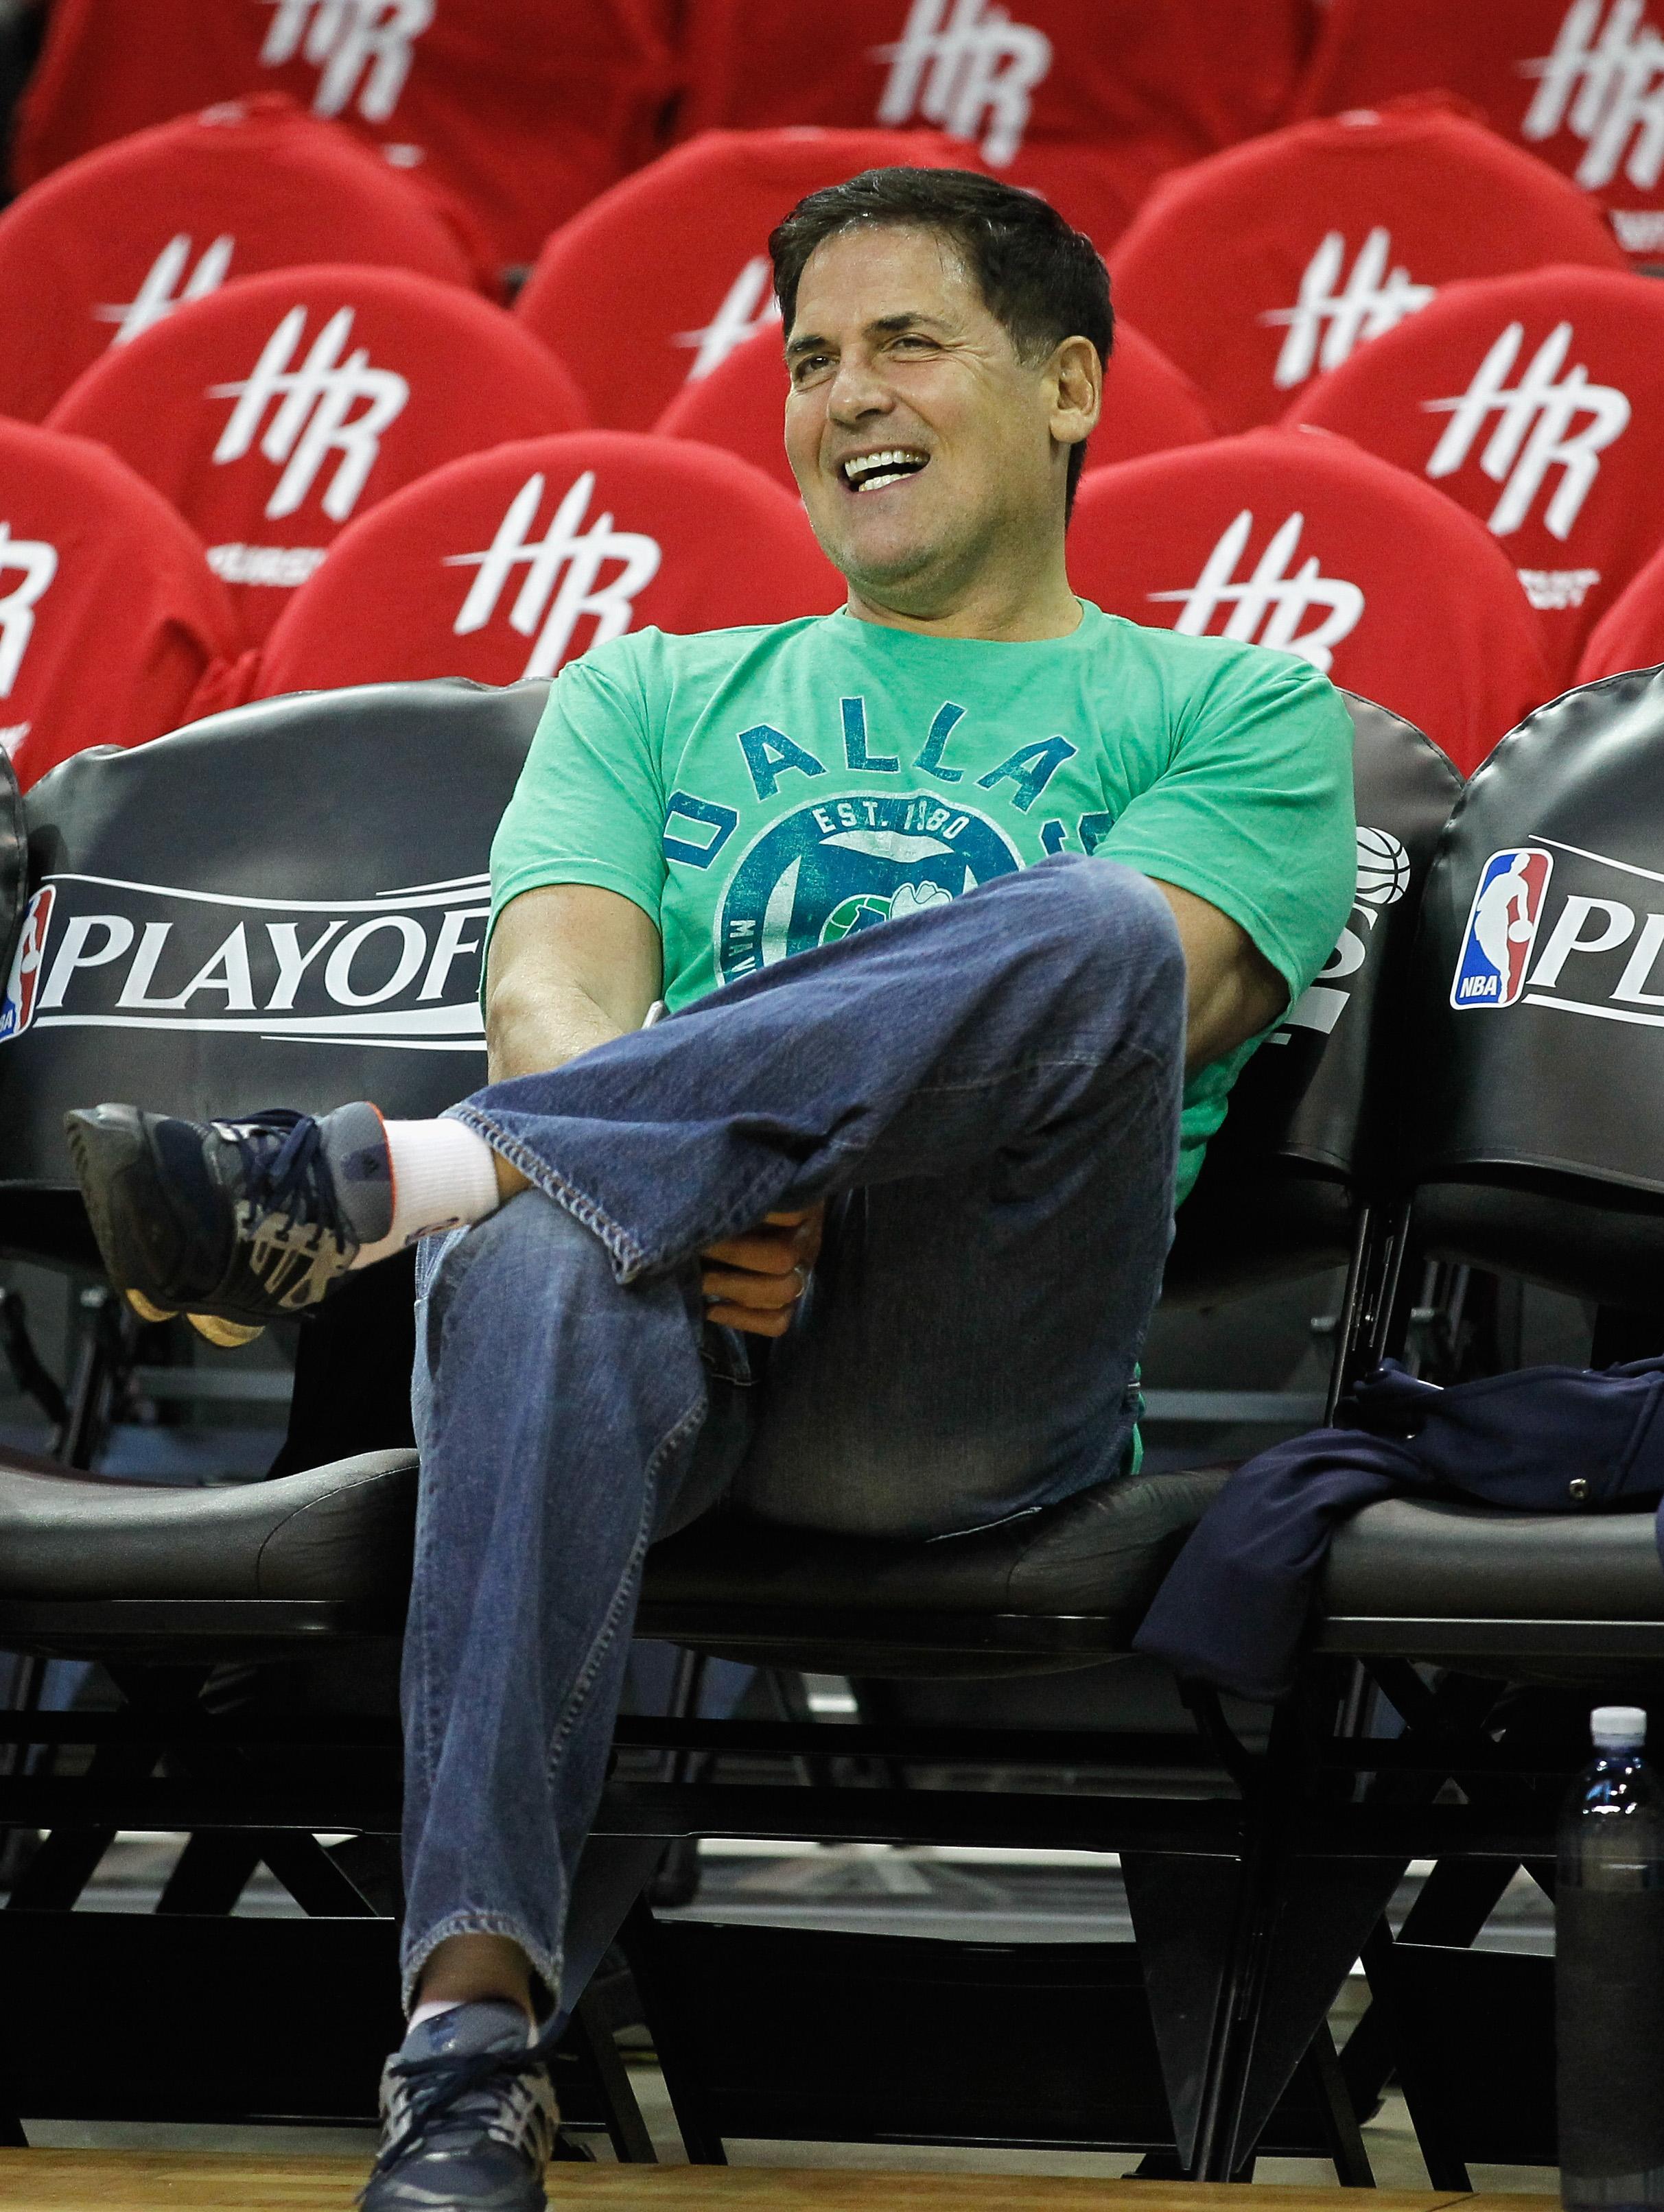 Dallas Mavericks owner Mark Cuban at the 2015 NBA Playoffs on April 21, 2015 in Houston, Texas.